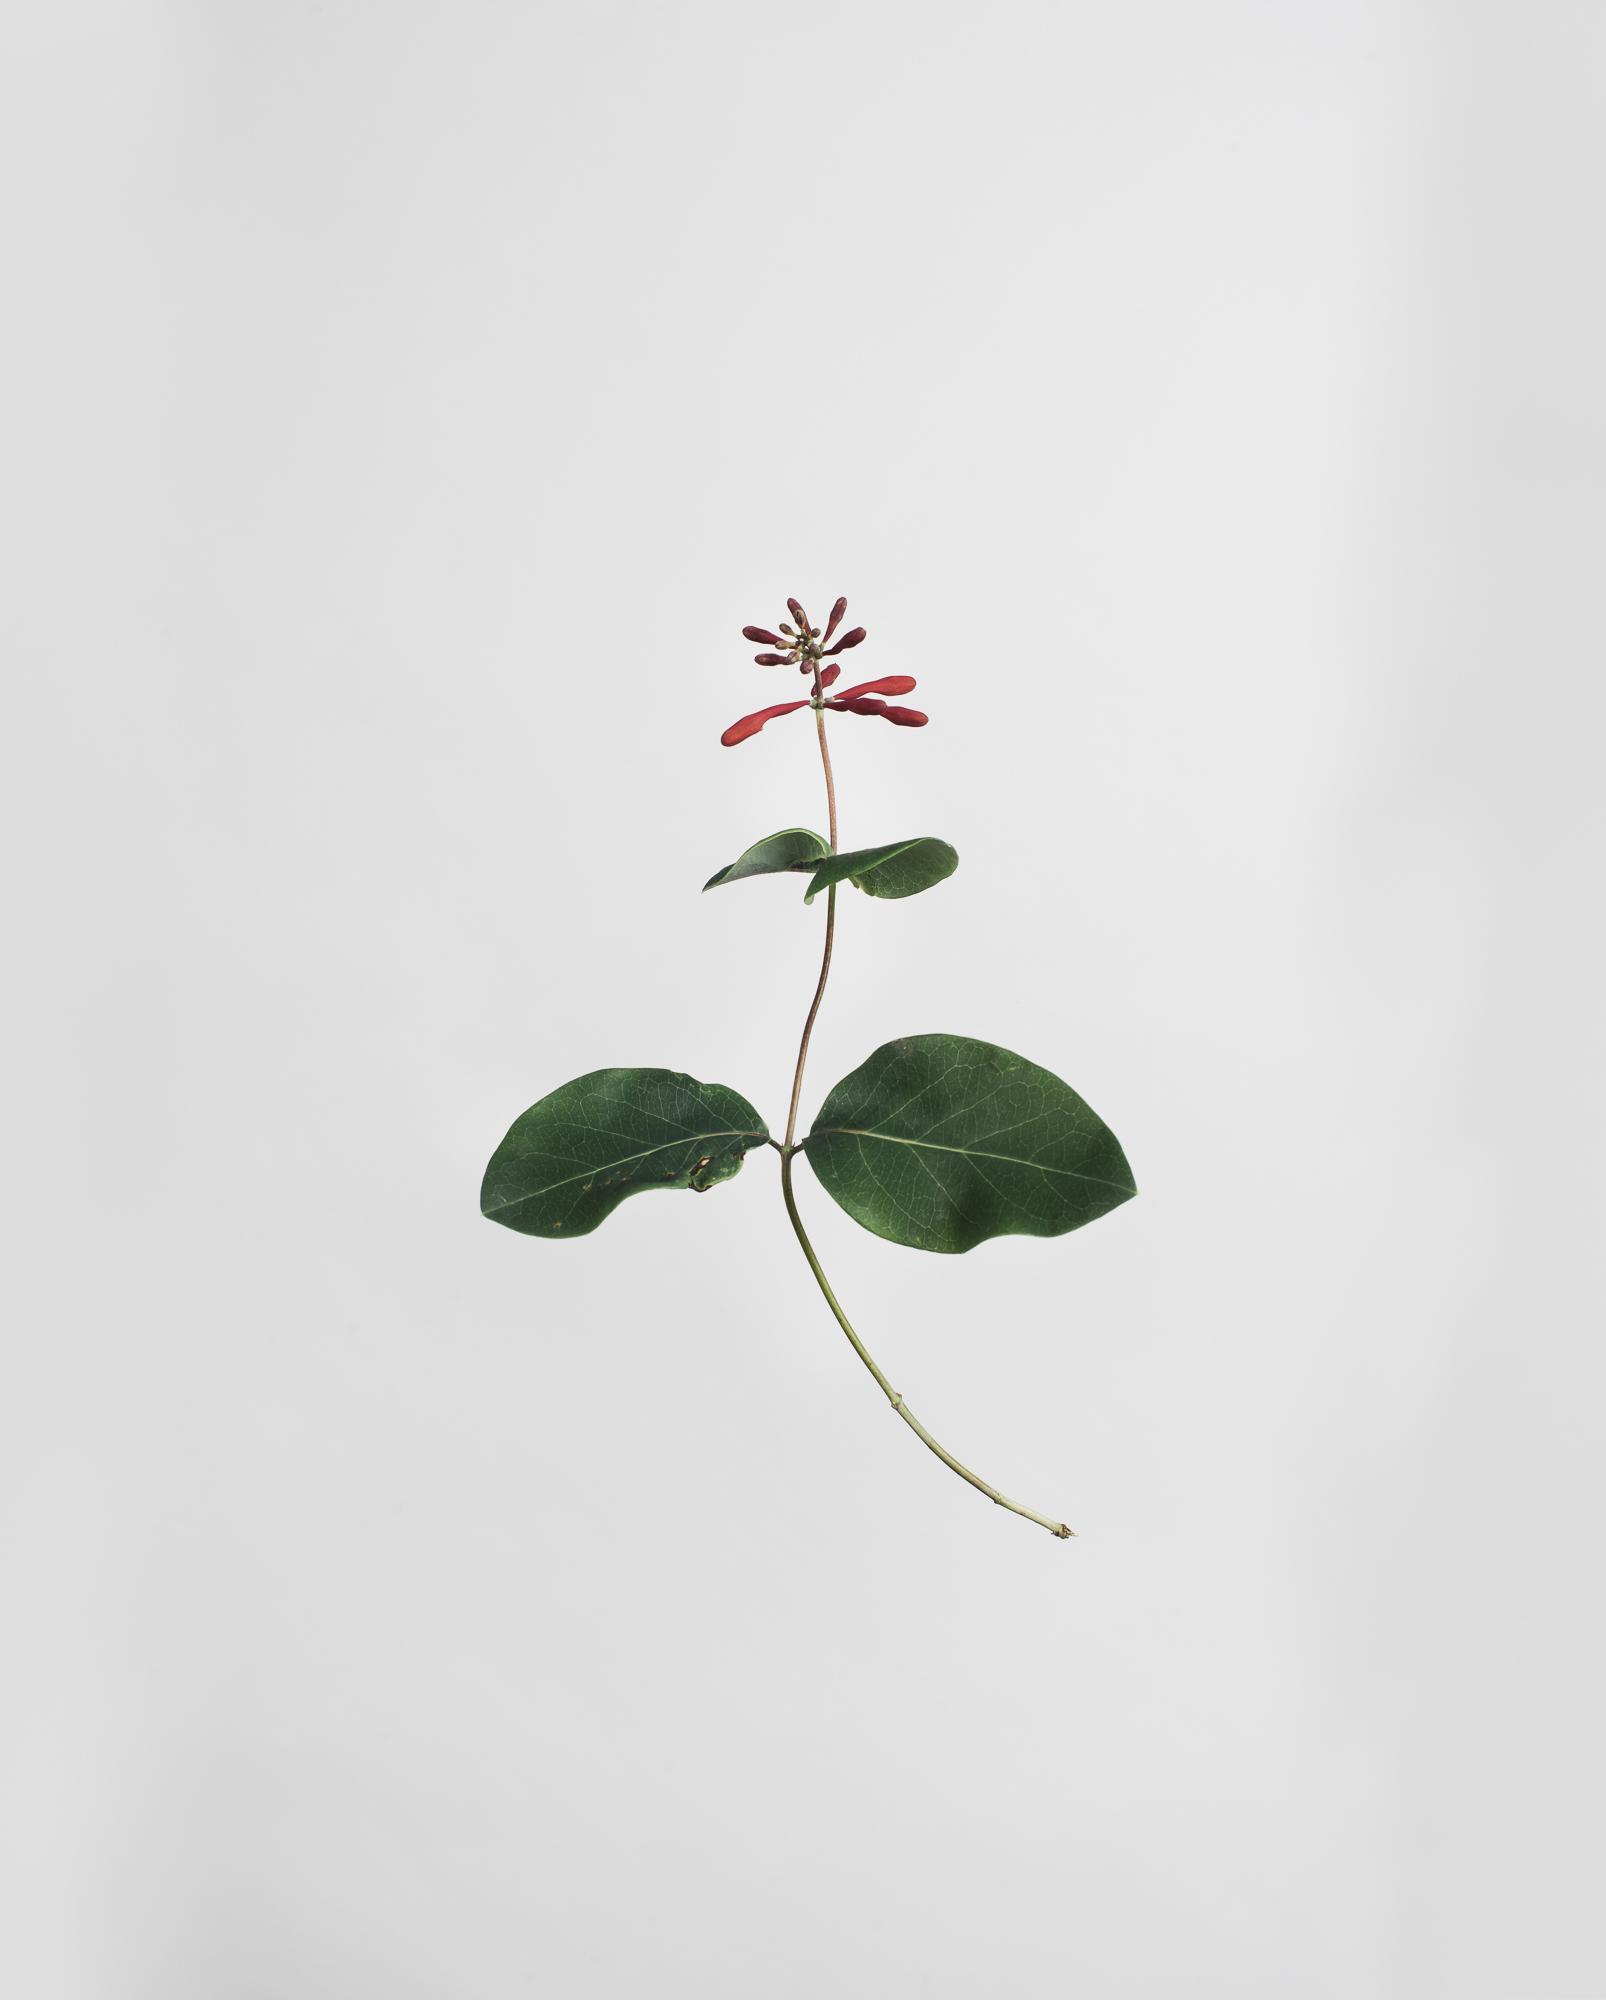 Lonicera hispidula - Pink Honeysuckle